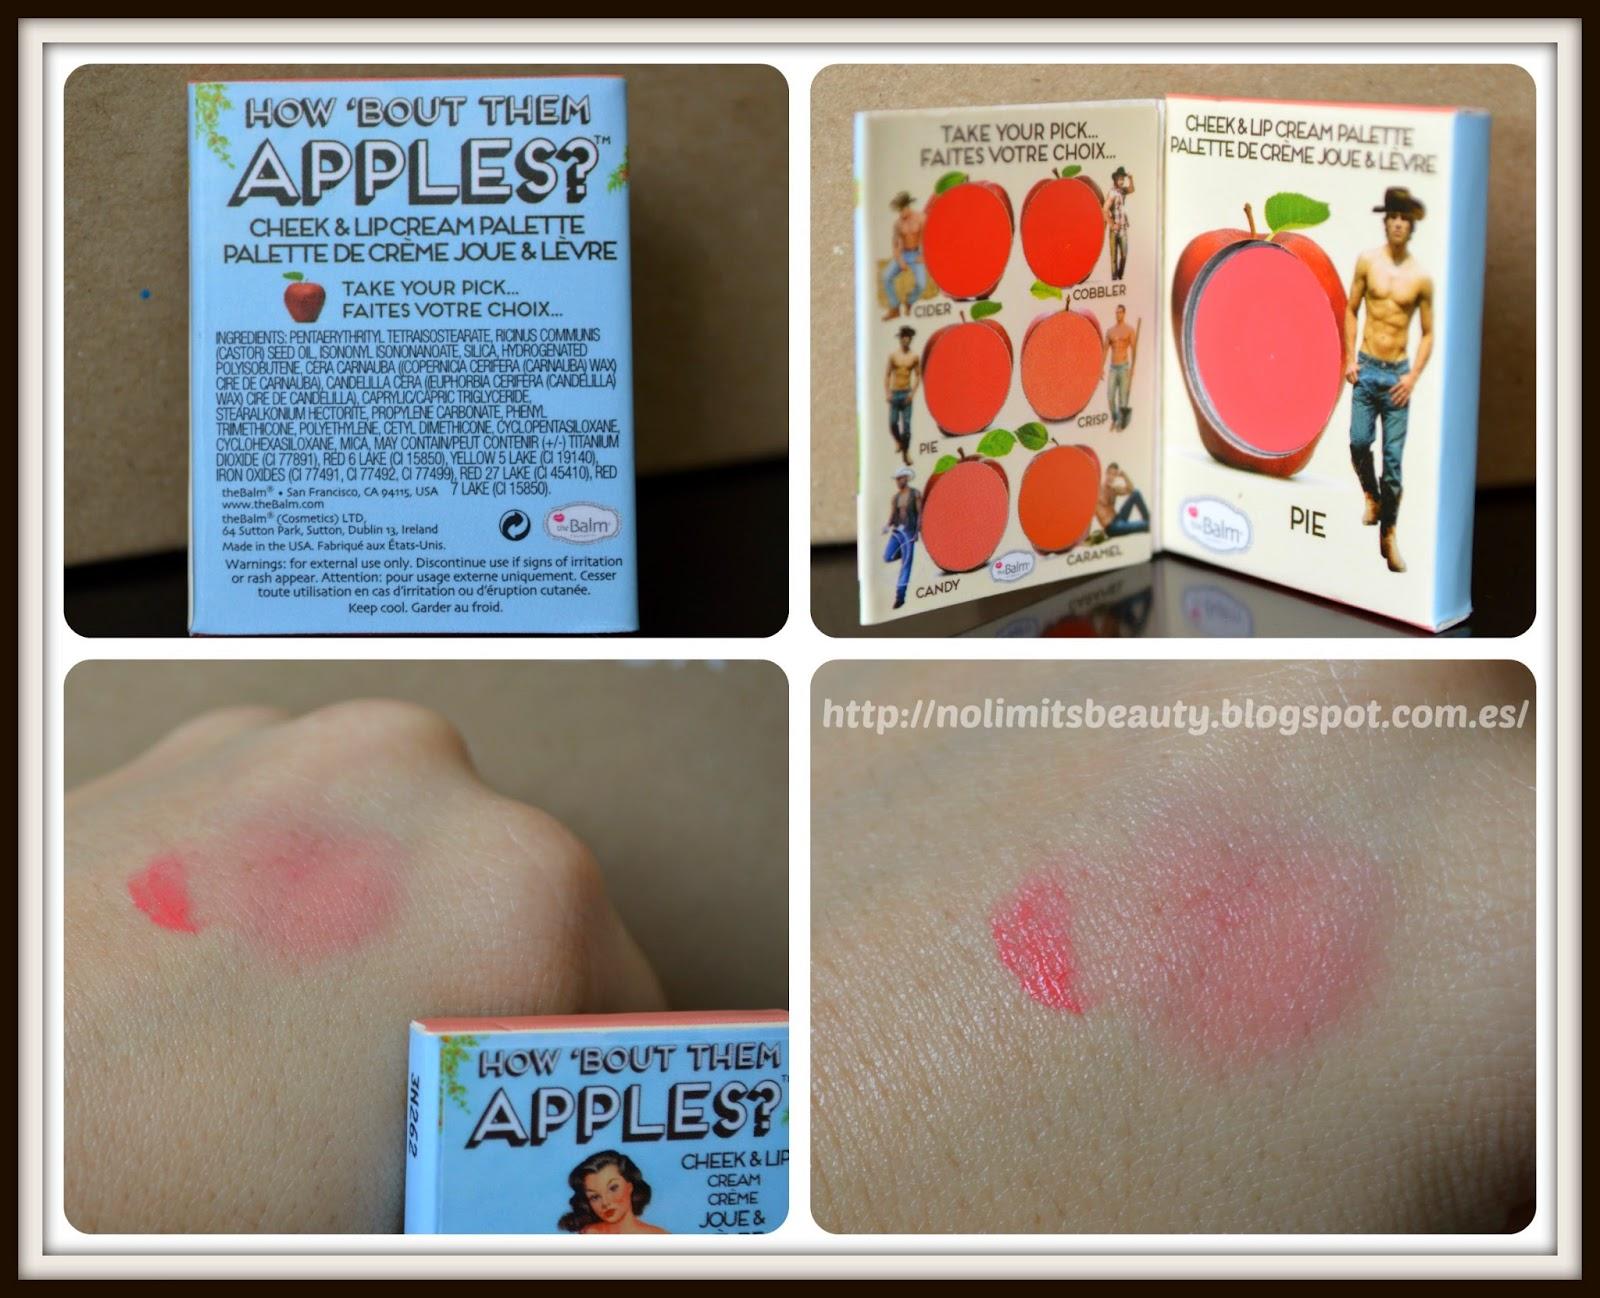 BirchBox Abril 2014 - Cheek & Lip Cream de The Balm (swatches)